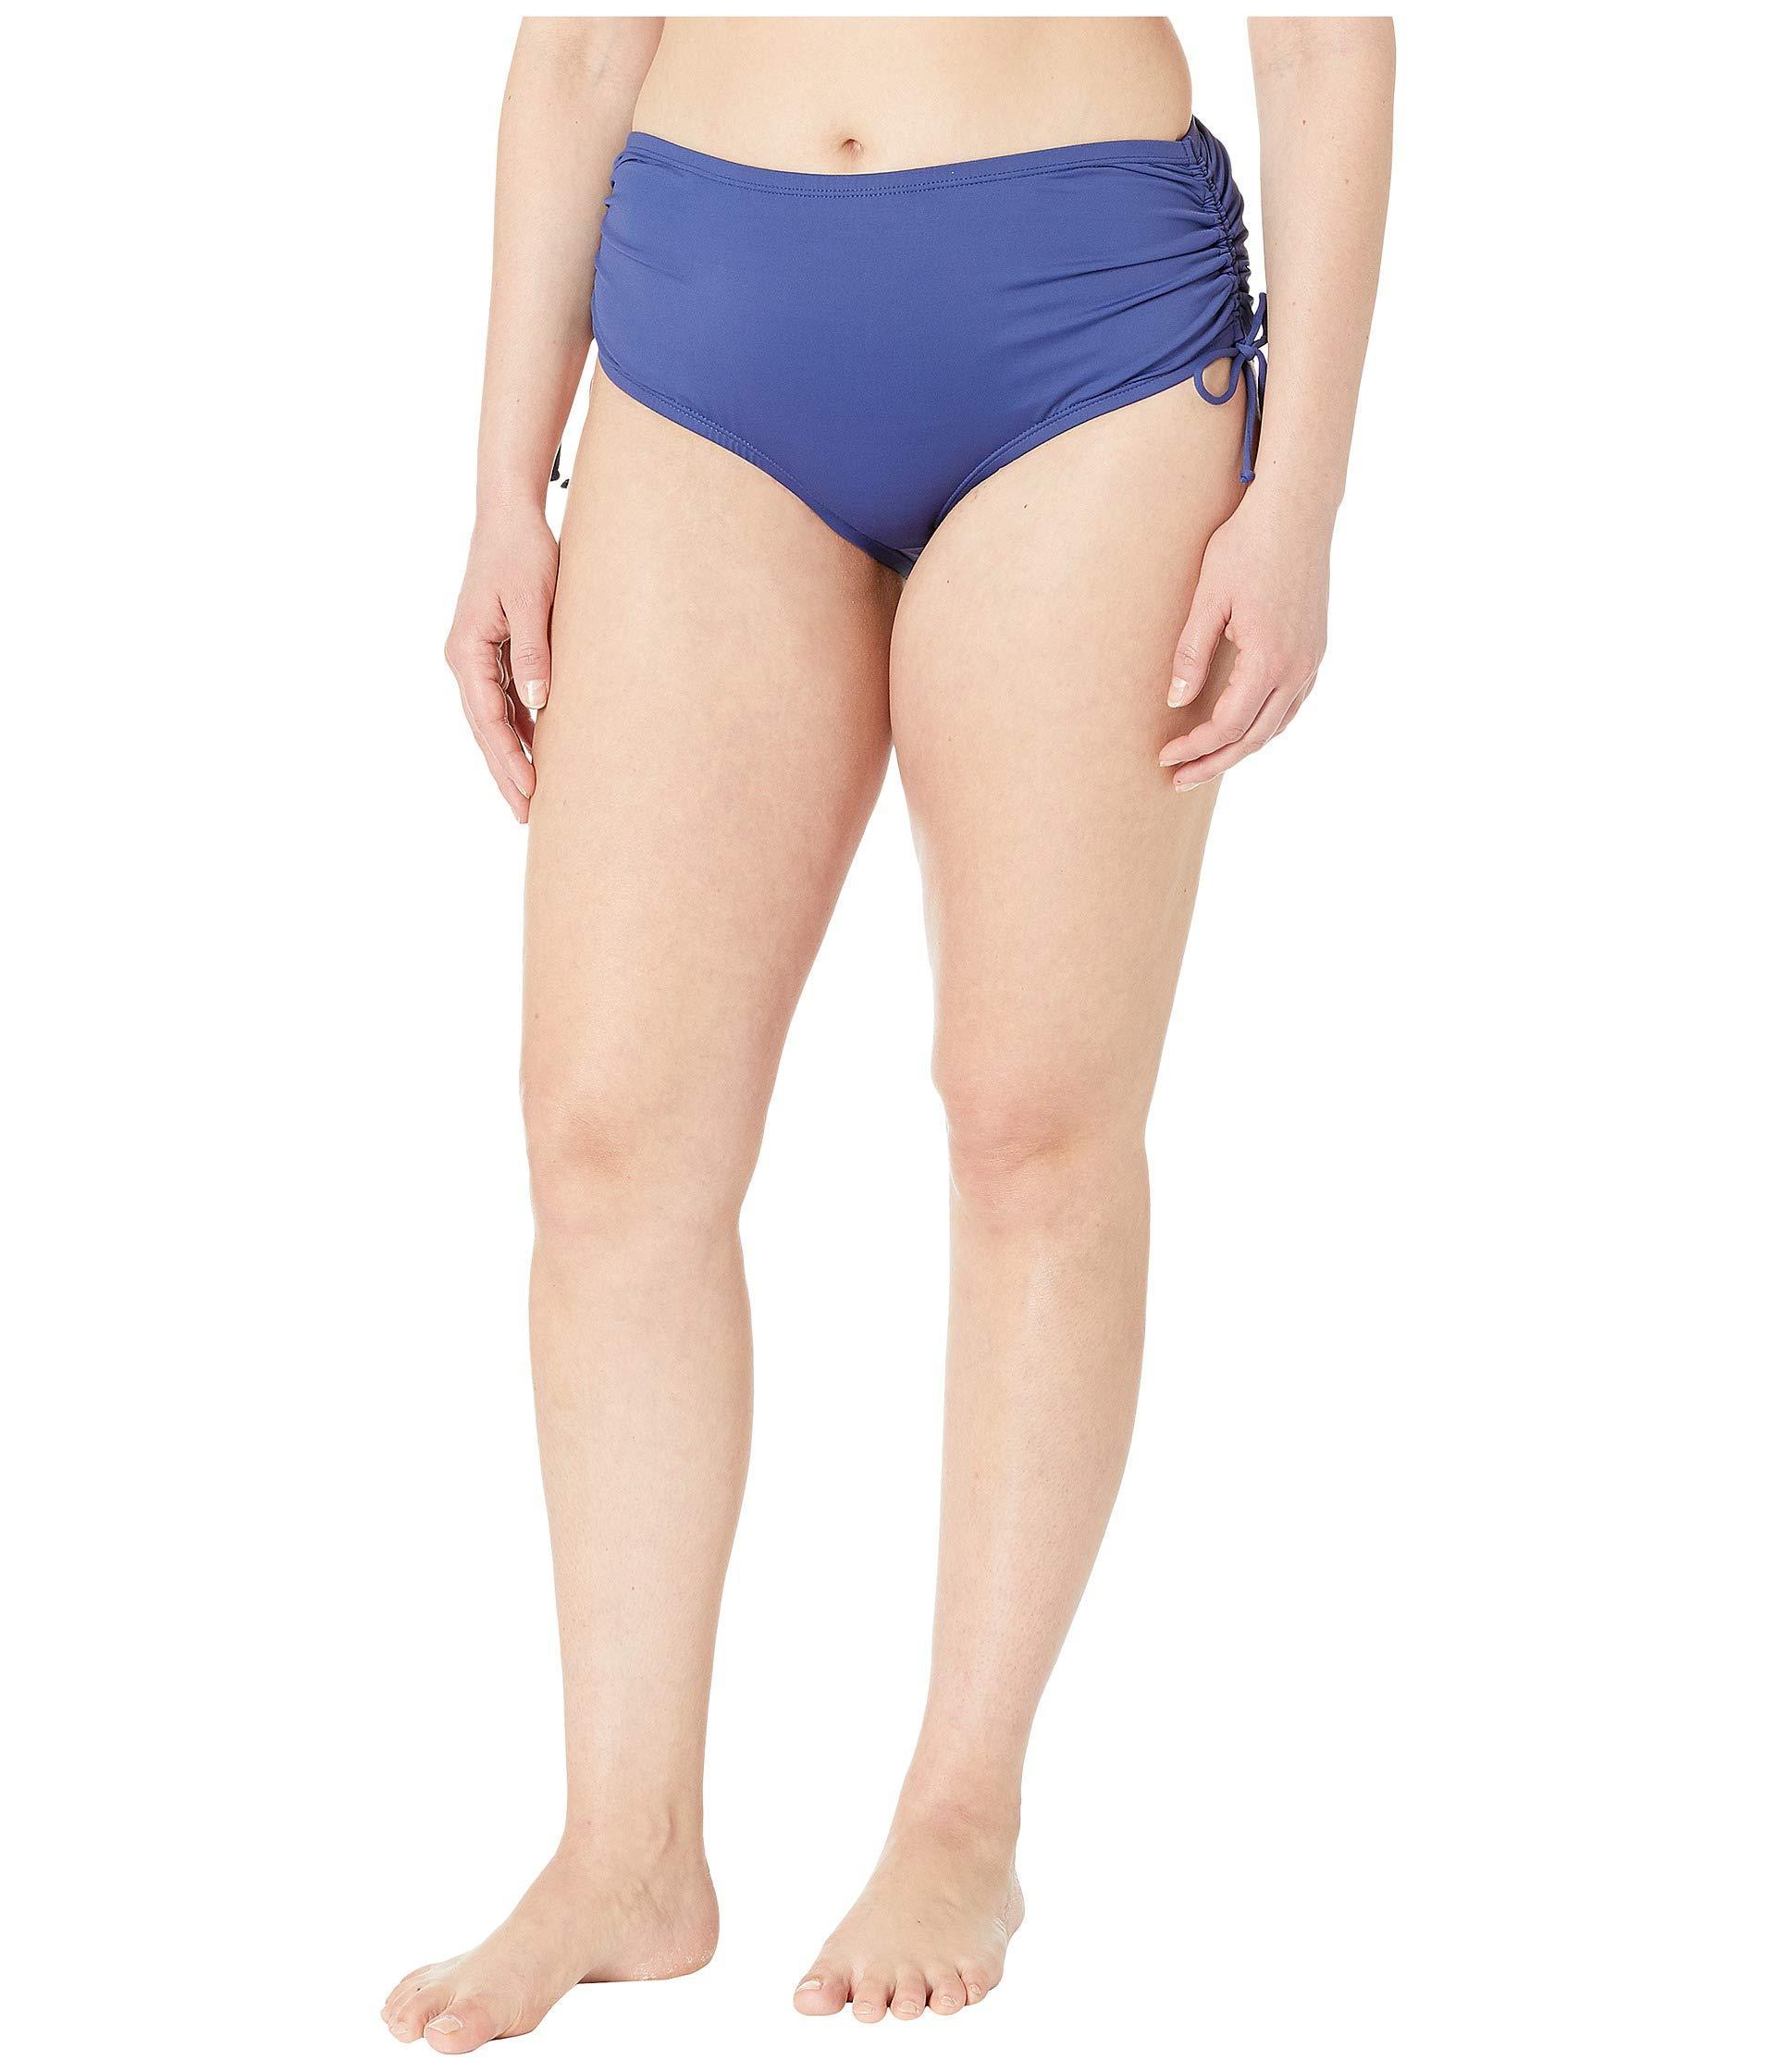 932d1ef36ae 24th   Ocean. Blue Plus Size Solids Mid Waist Adjustable Tie Side Pant  Bottoms ...